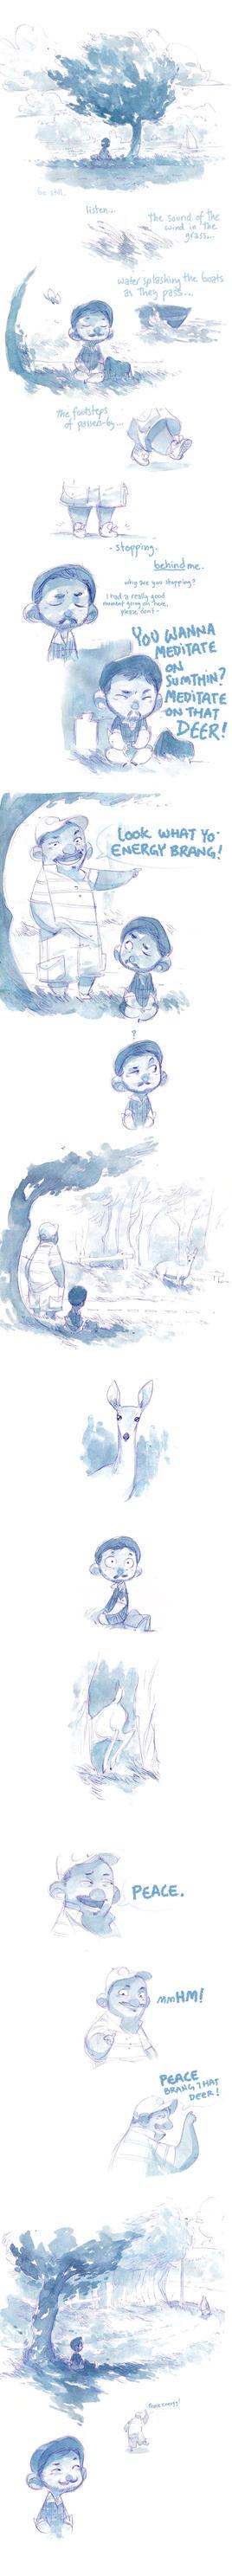 Watercolor Comic - Peace Energy by nicholaskole